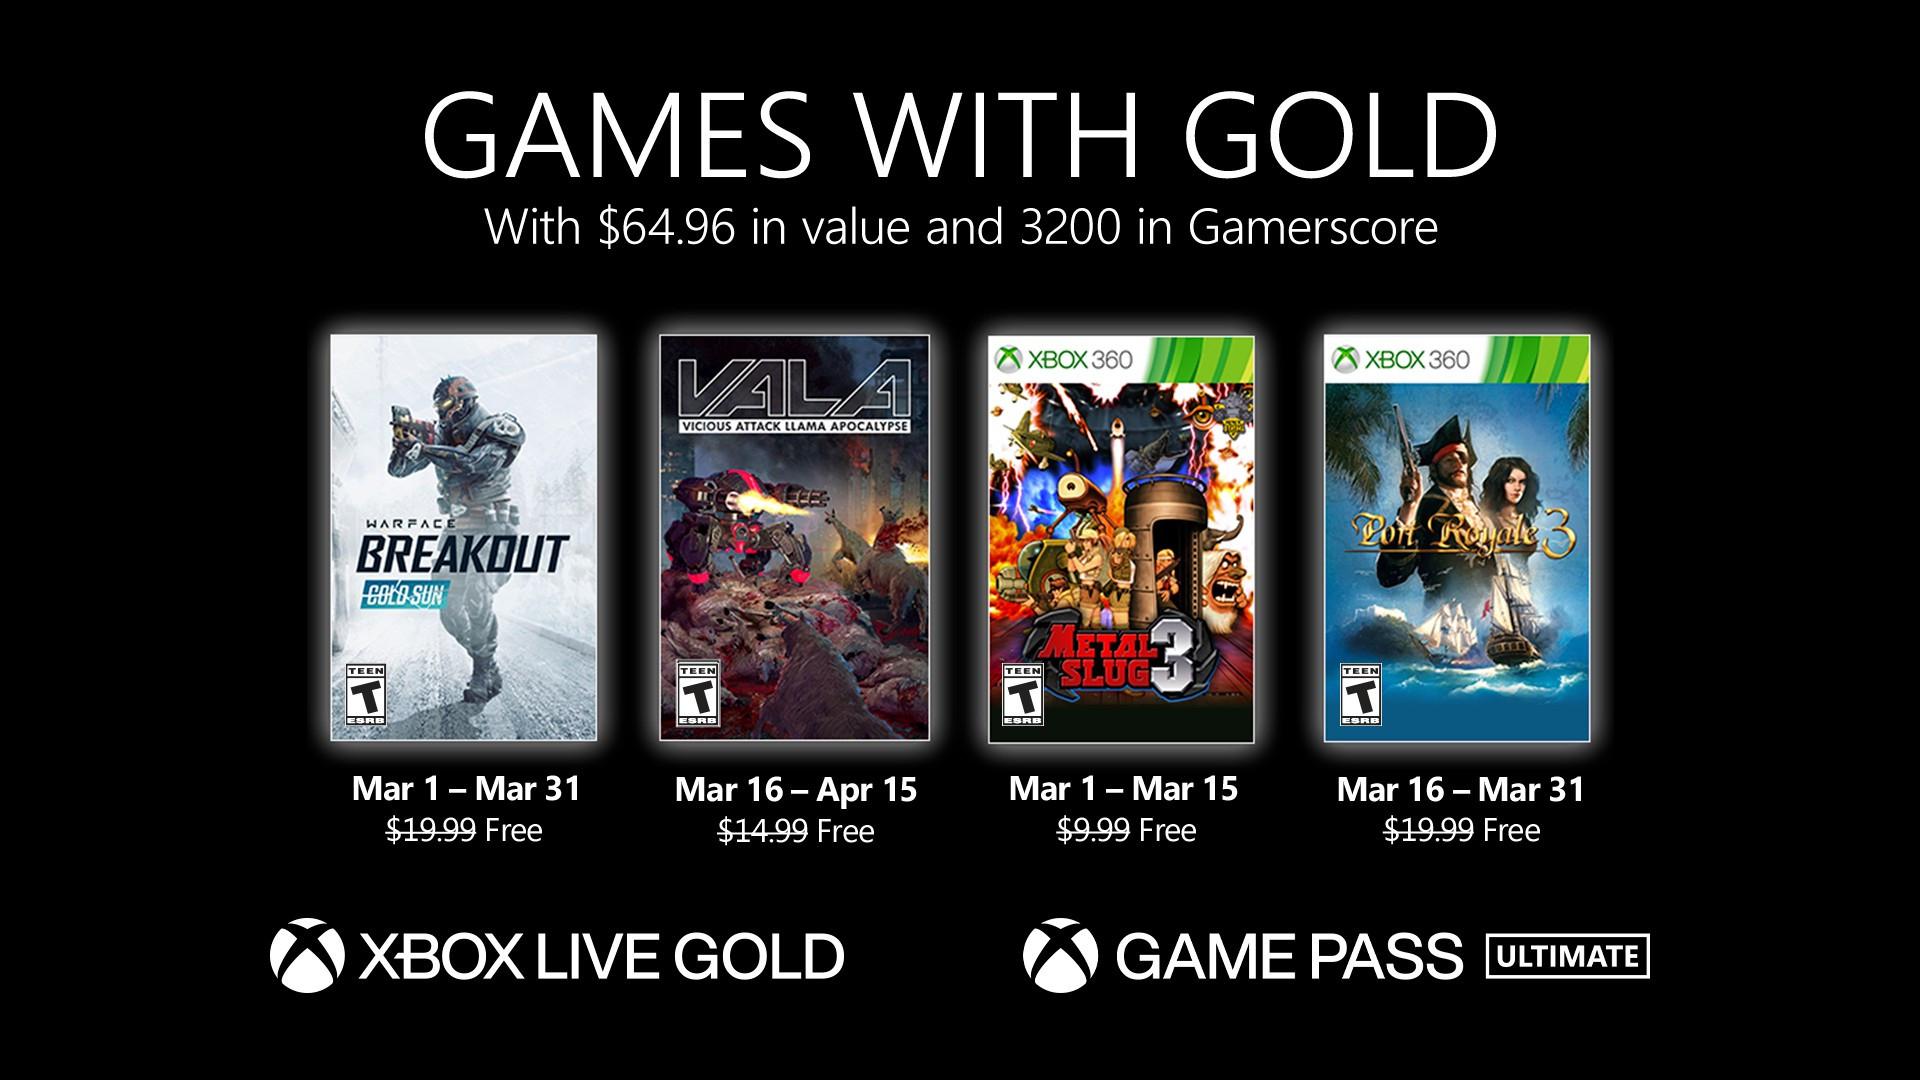 Xbox Games Gold März: Warface: Breakout, Vicious Attack Llama Apocalypse, Metal Slug 3 & Port Royale 3